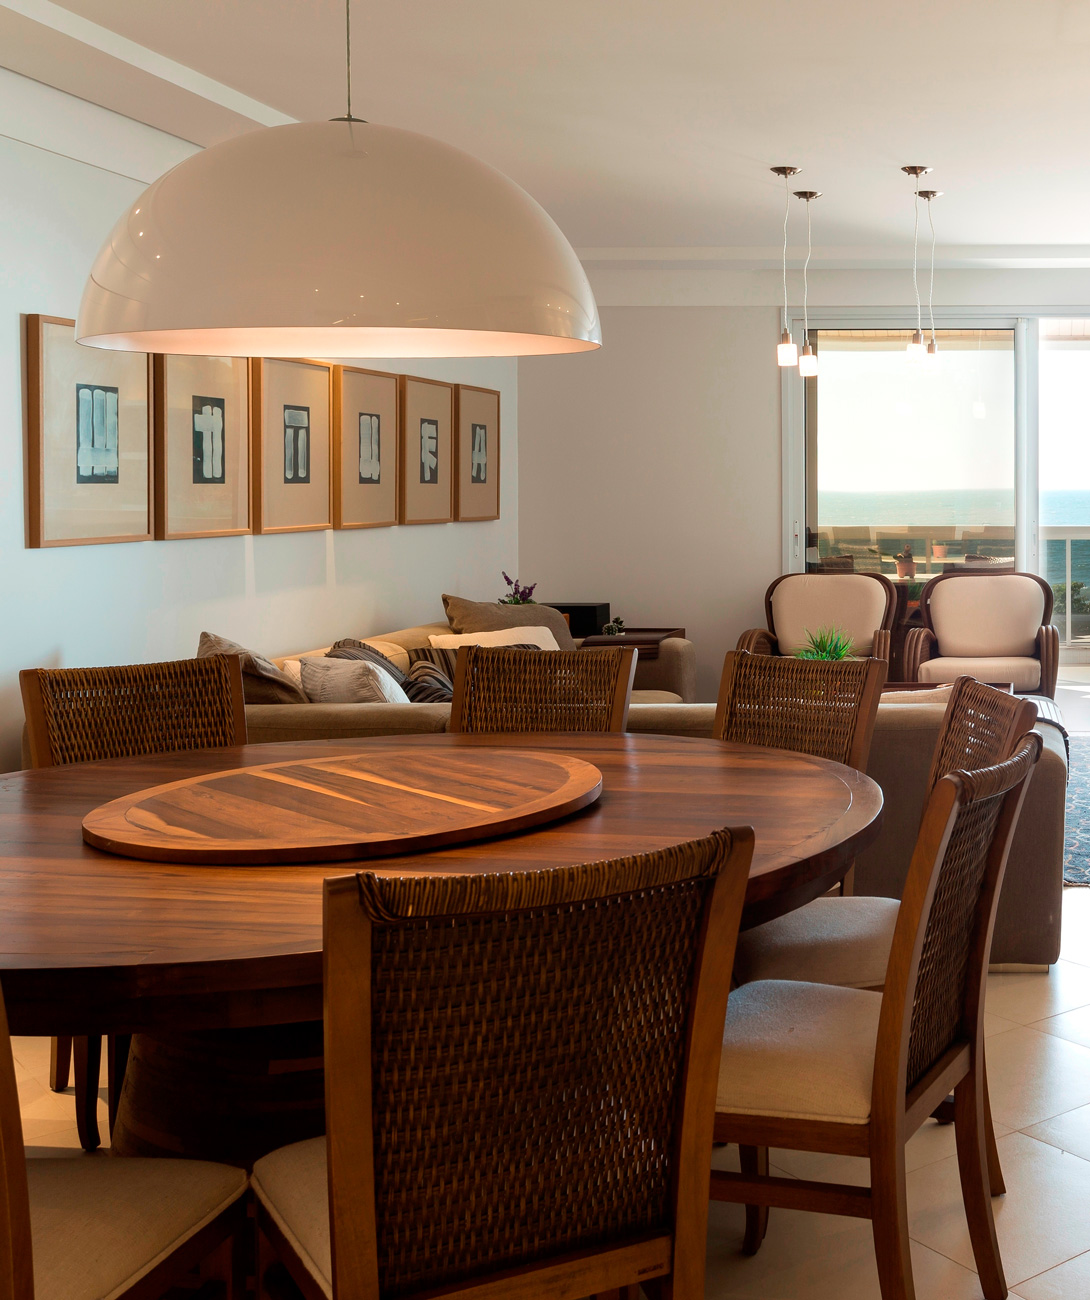 http://www.theissgirardi.com.br/img/apartamento-lagoinha/img_007.jpg